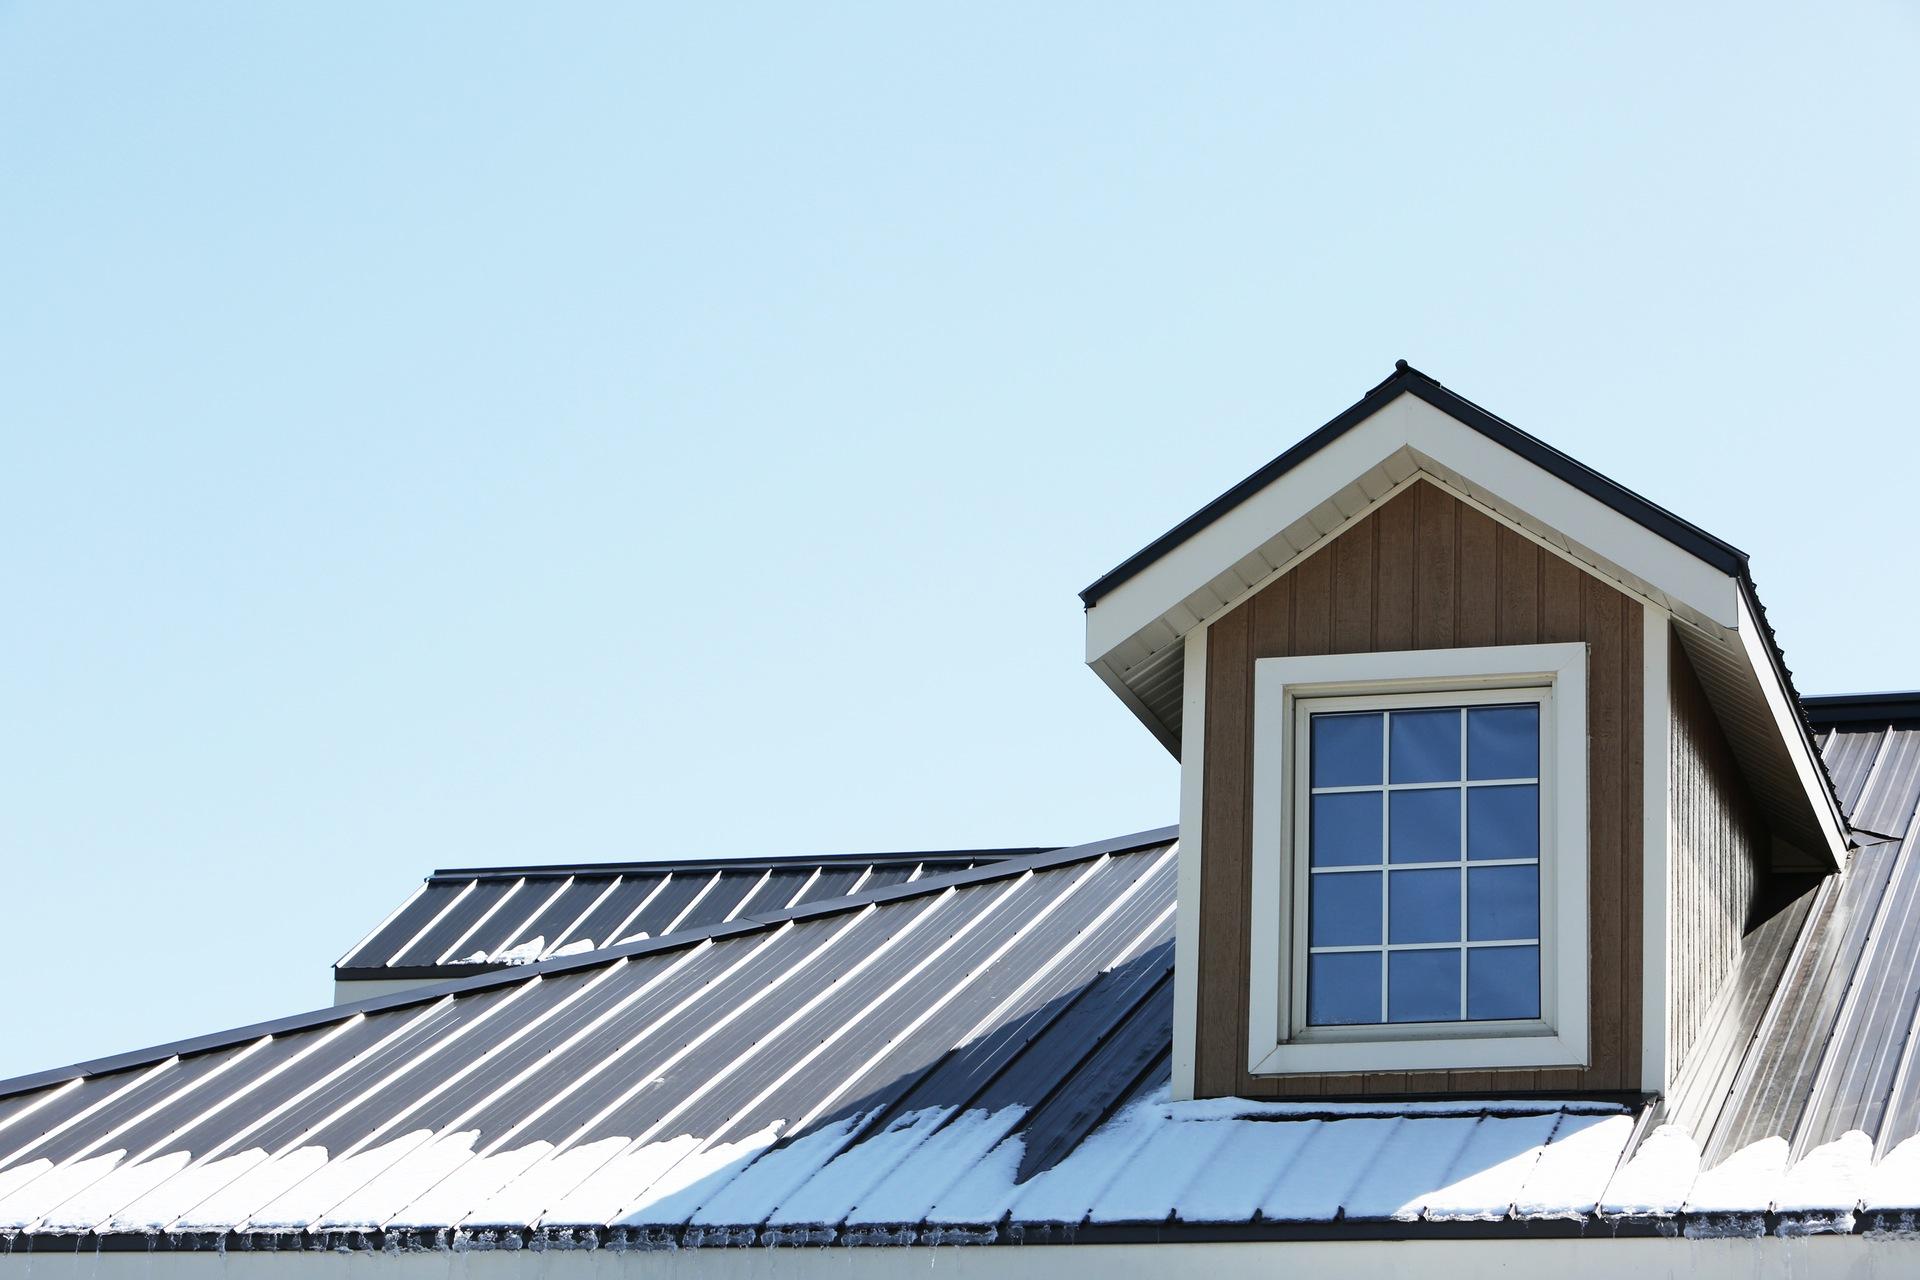 lexington ky roofing